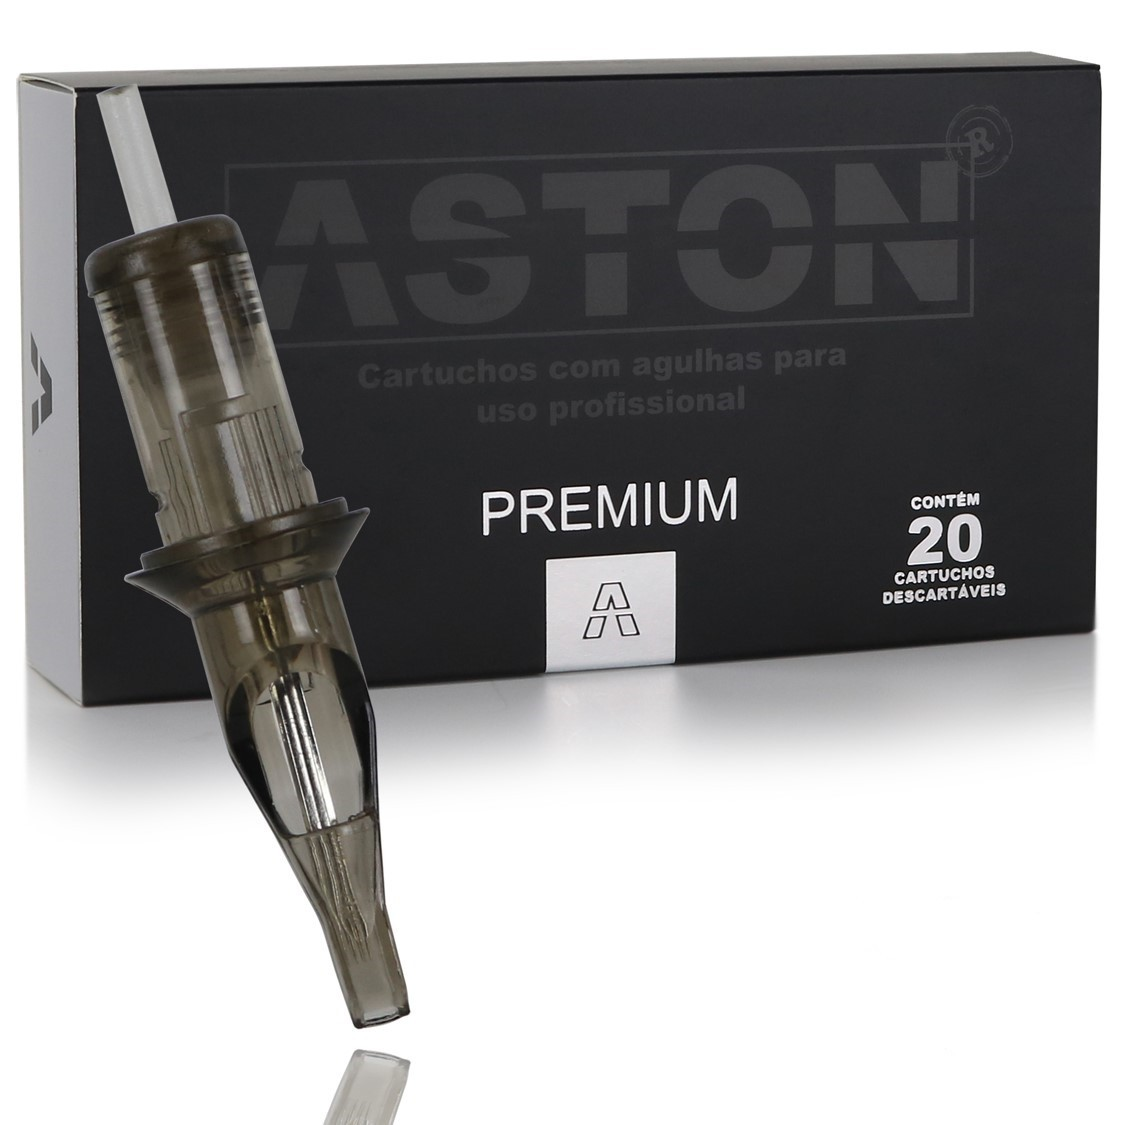 CARTUCHO ASTON PREMIUM PINTURA MG - 1009MG